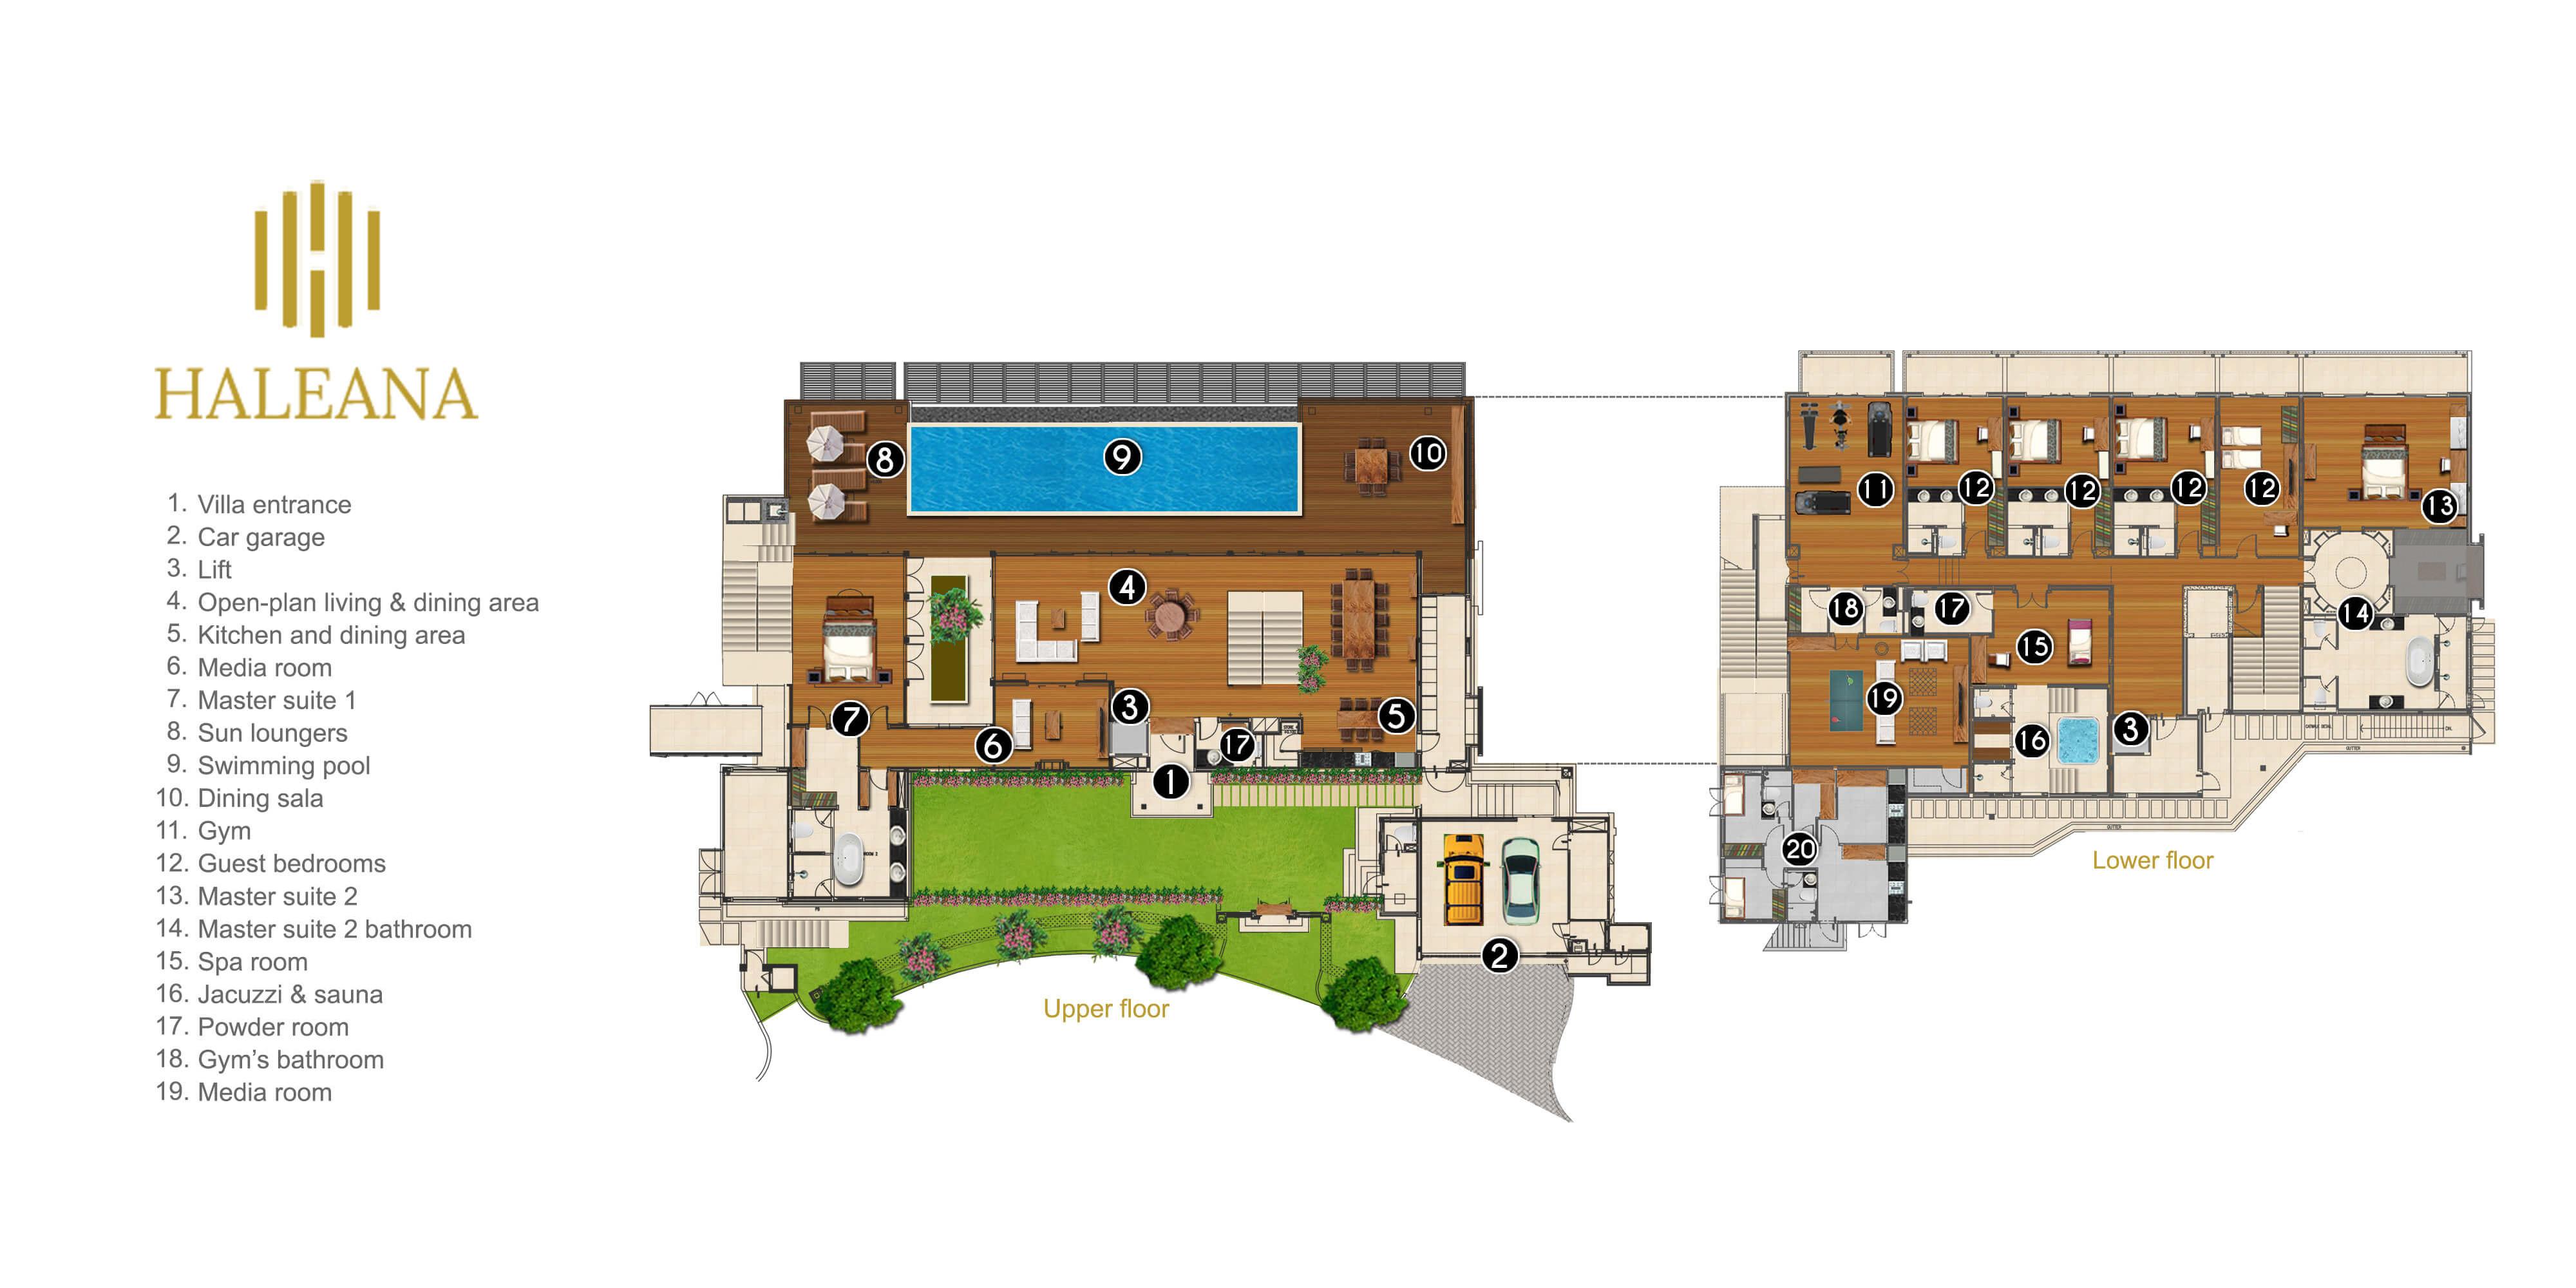 Malaiwana Villa Haleana Floorplan Elite Havens